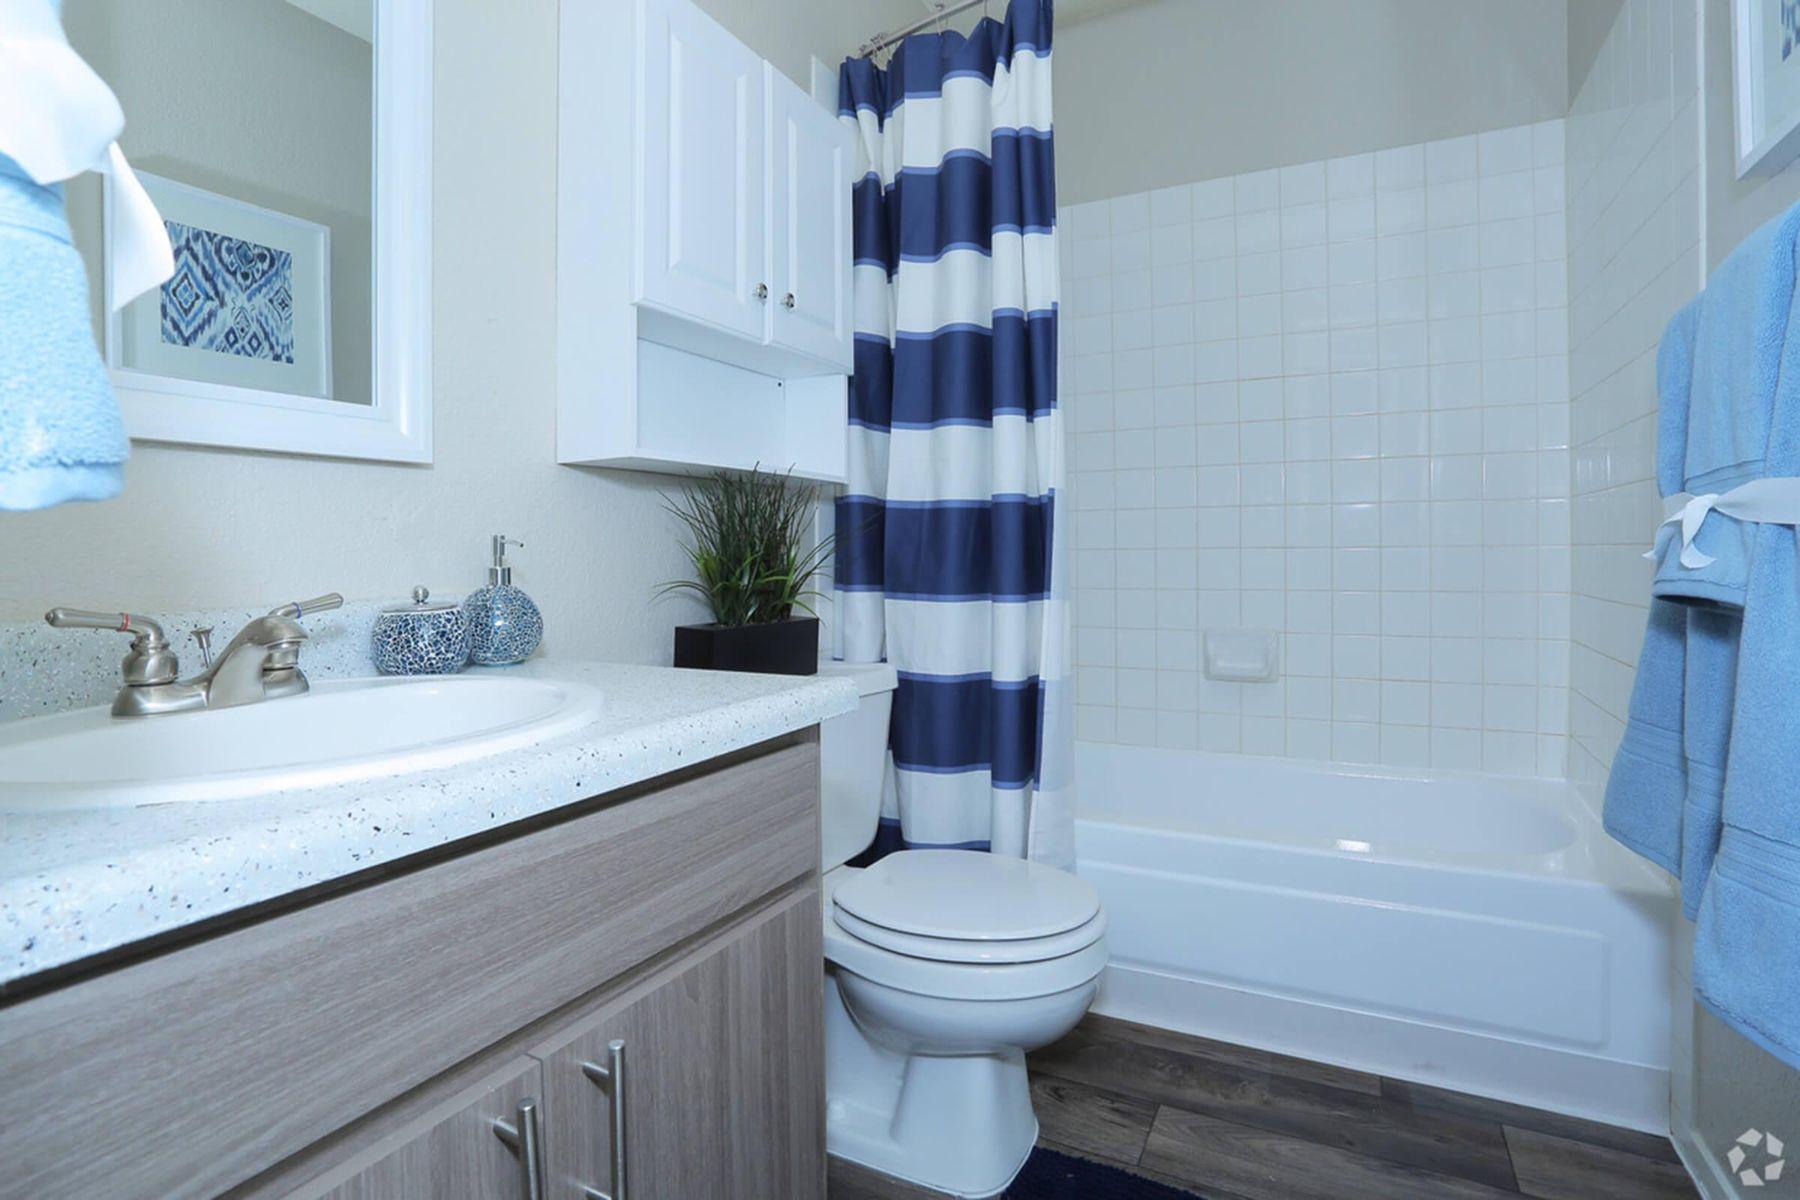 sunset-hills-apartments-henderson-nv-2br-2ba---960-sf-bathroom.jpg